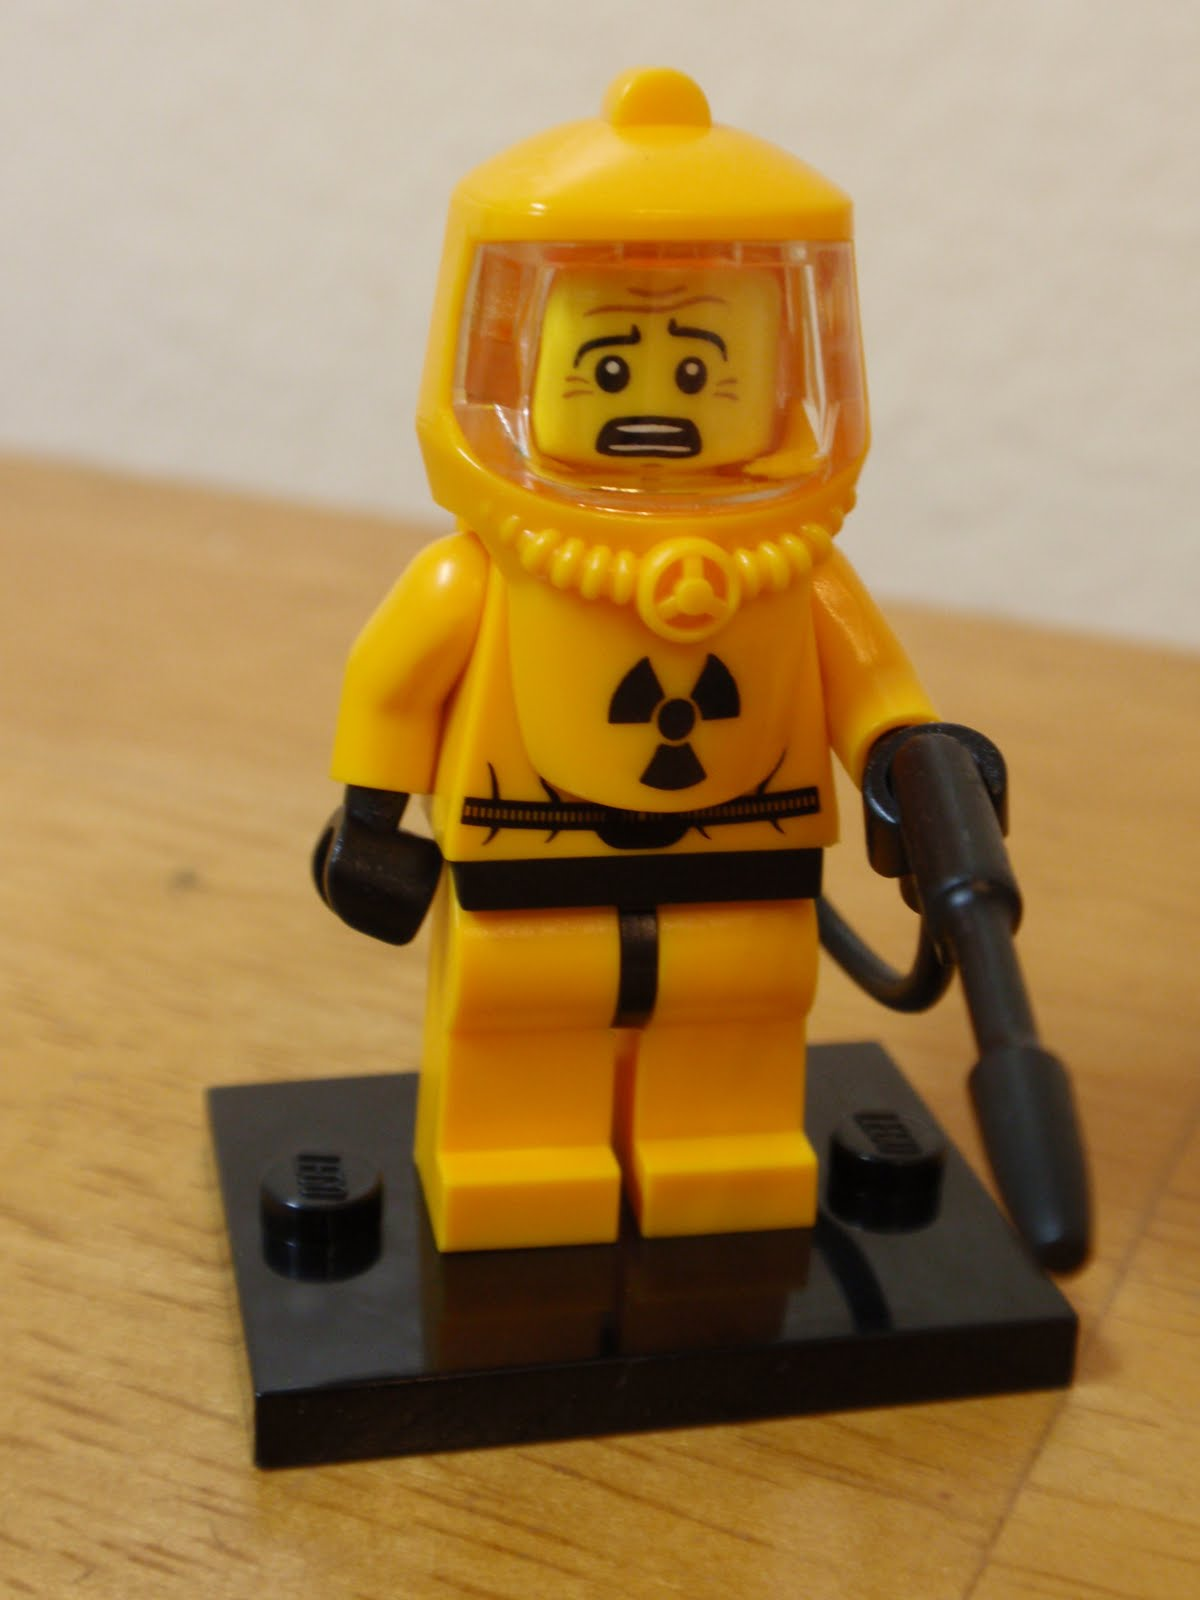 A Year of Toys 50 LEGO Minifigures Hazmat Guy